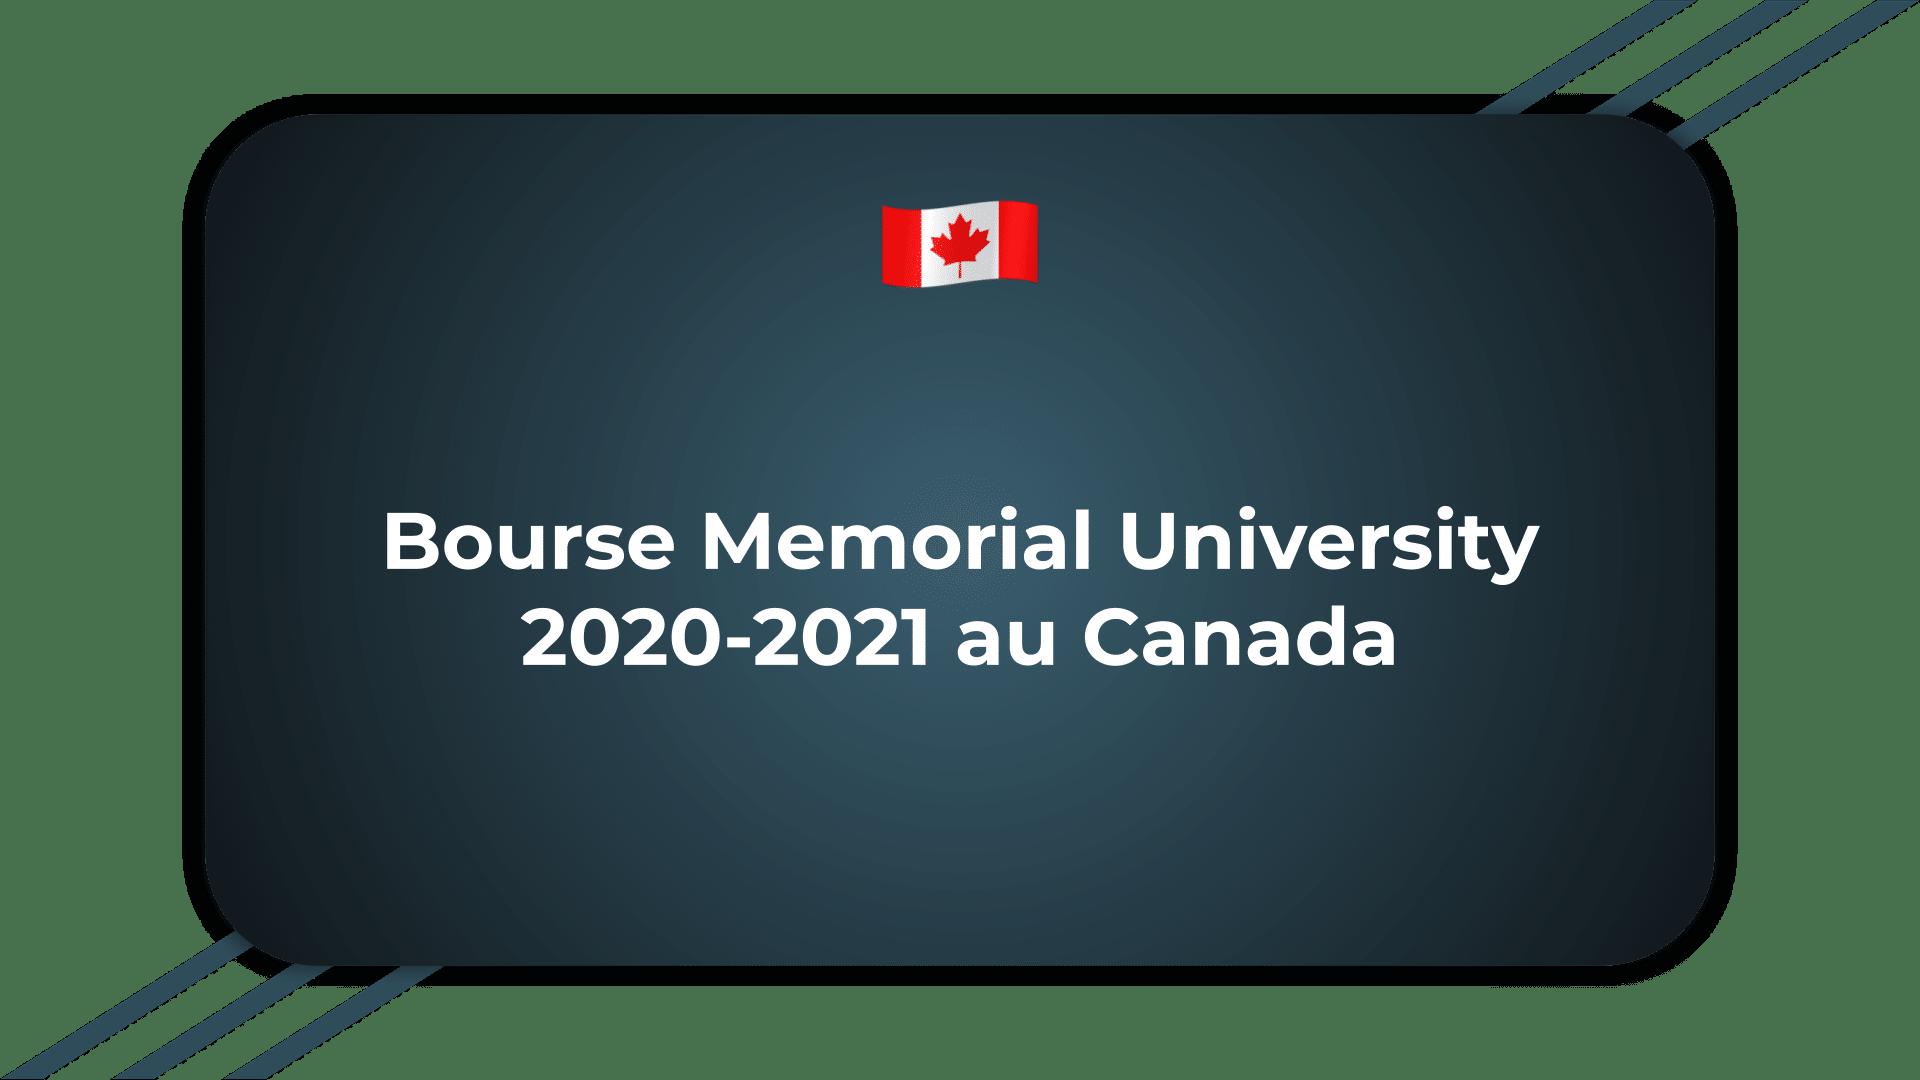 Bourse Memorial University